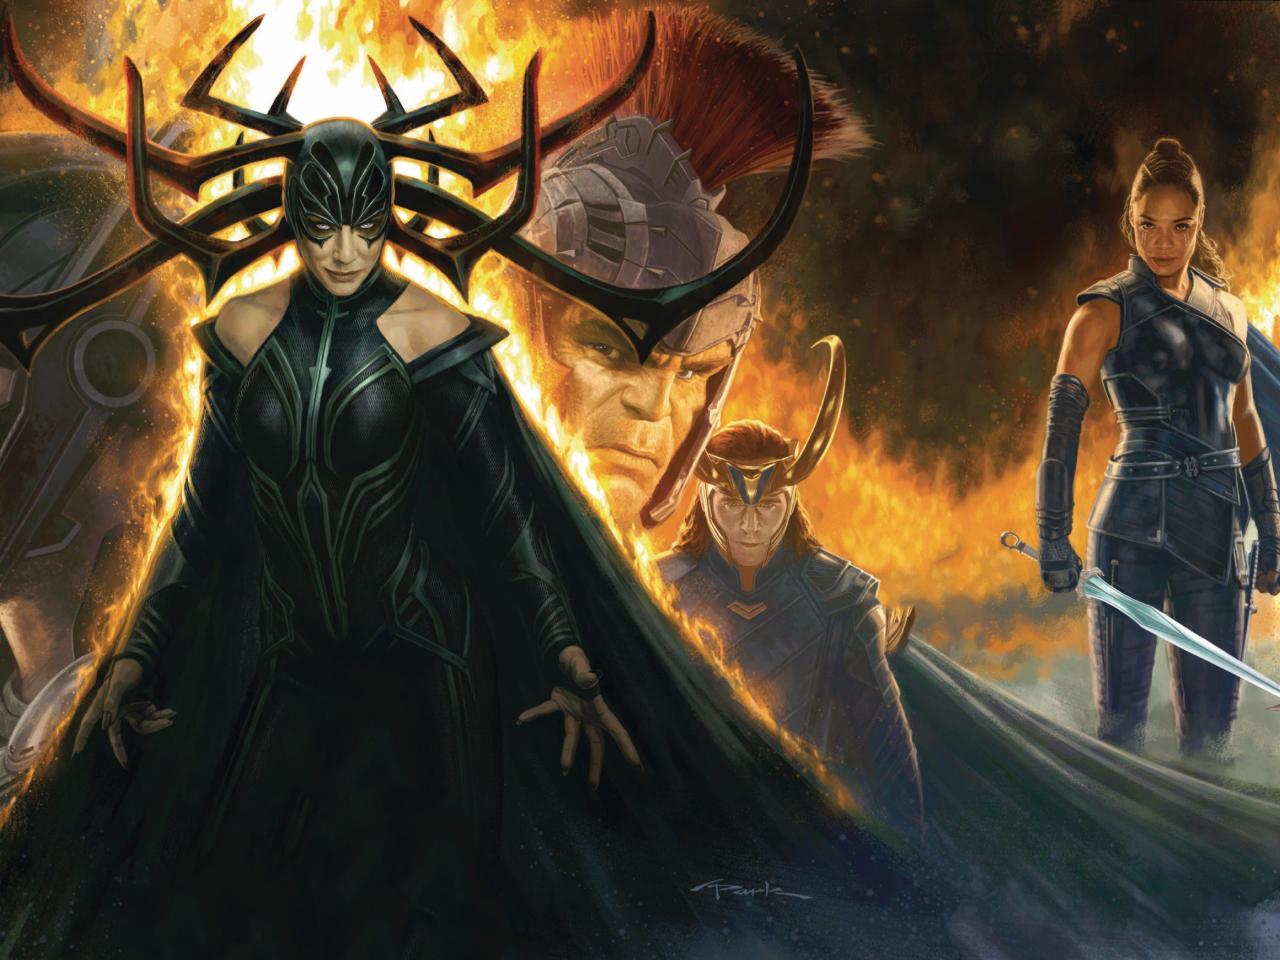 Thor Ragnarok Movie Cover 2017, HD 4K Wallpaper